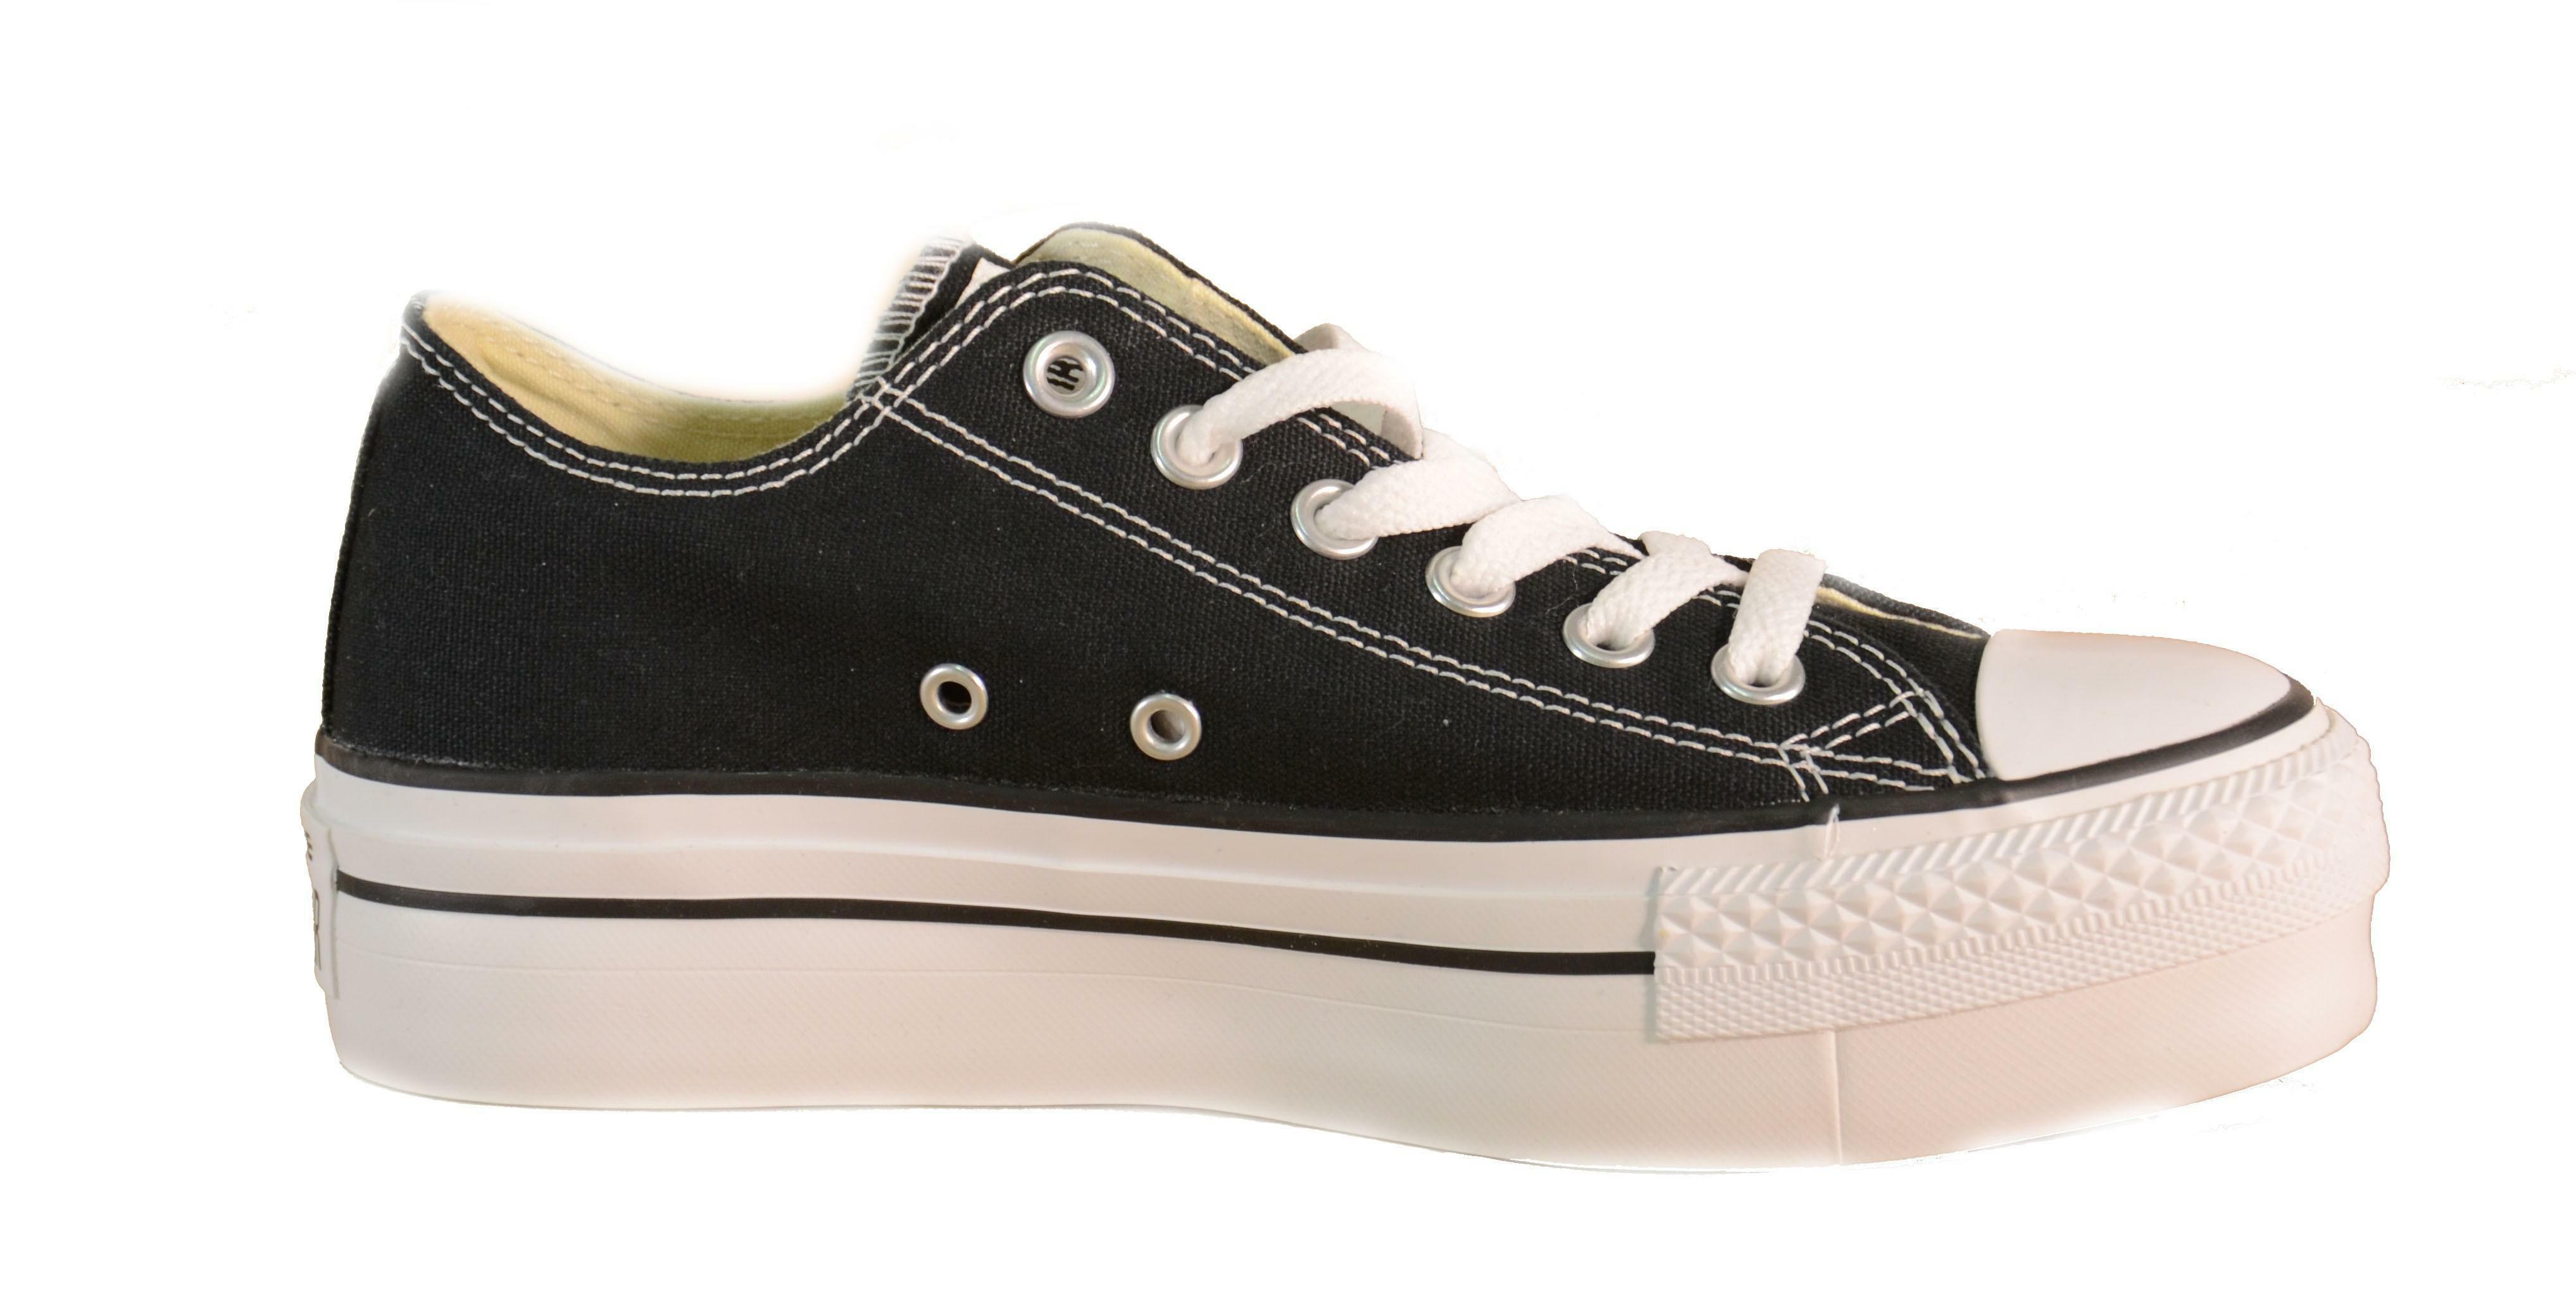 converse converse all star ct platform ox scarpe sportive donna nere tela lacci 540266c